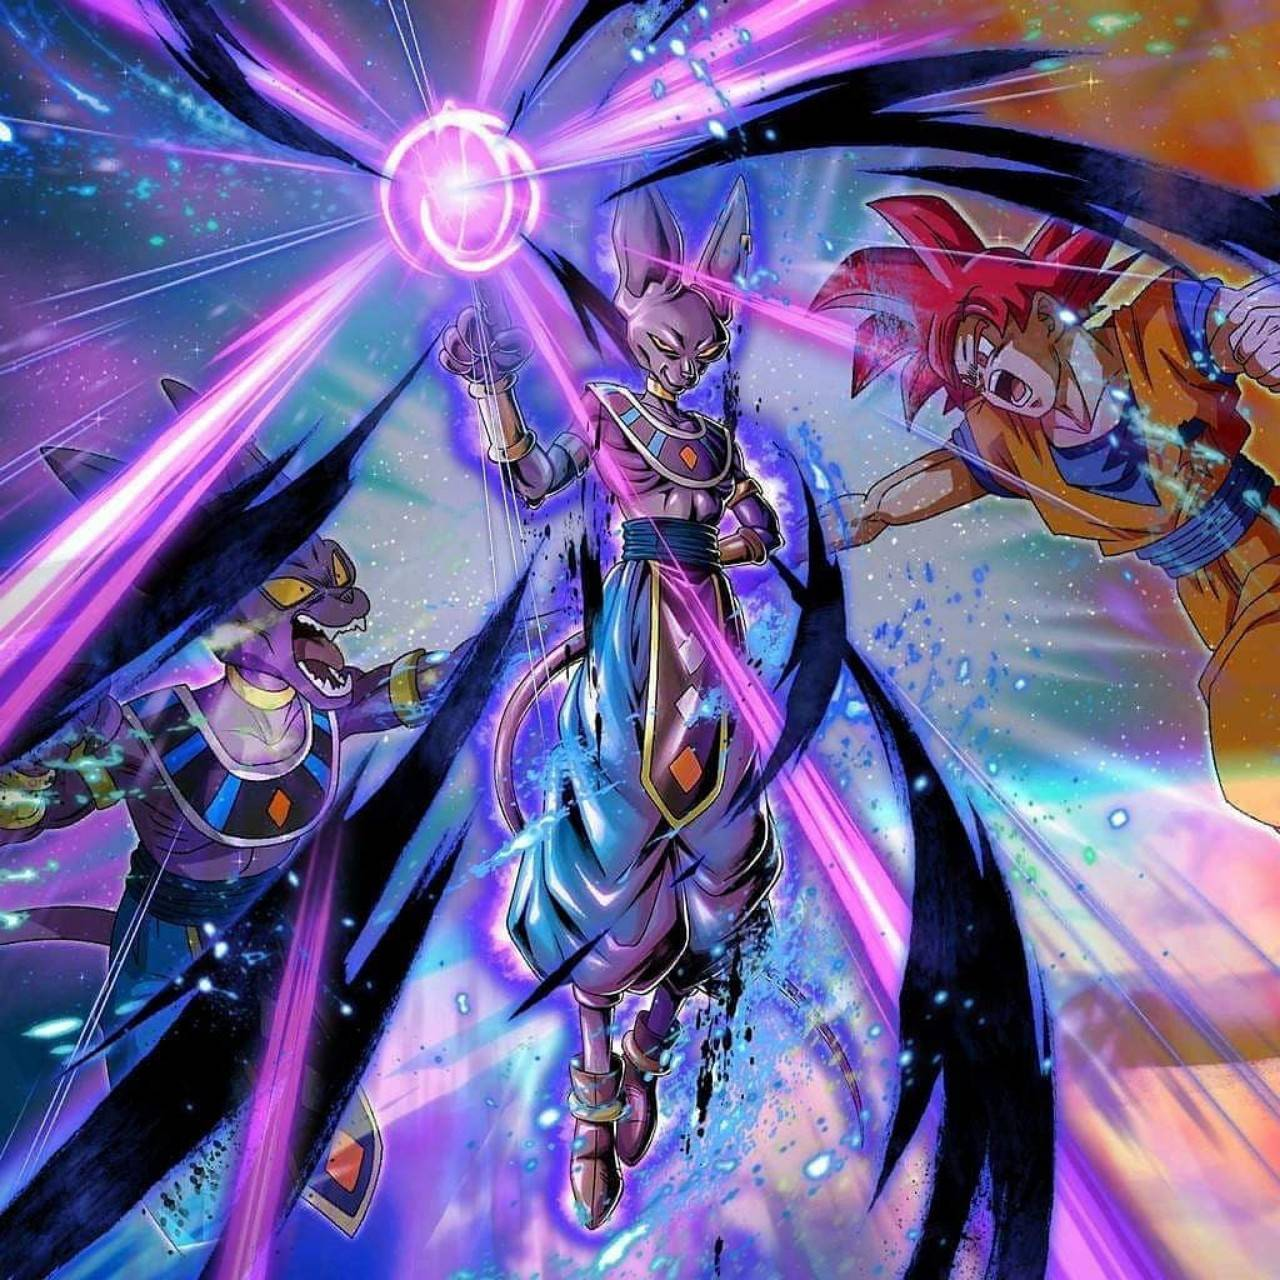 Beerus Vs Goku Wallpaper By Dragonball Art A8 Free On Zedge